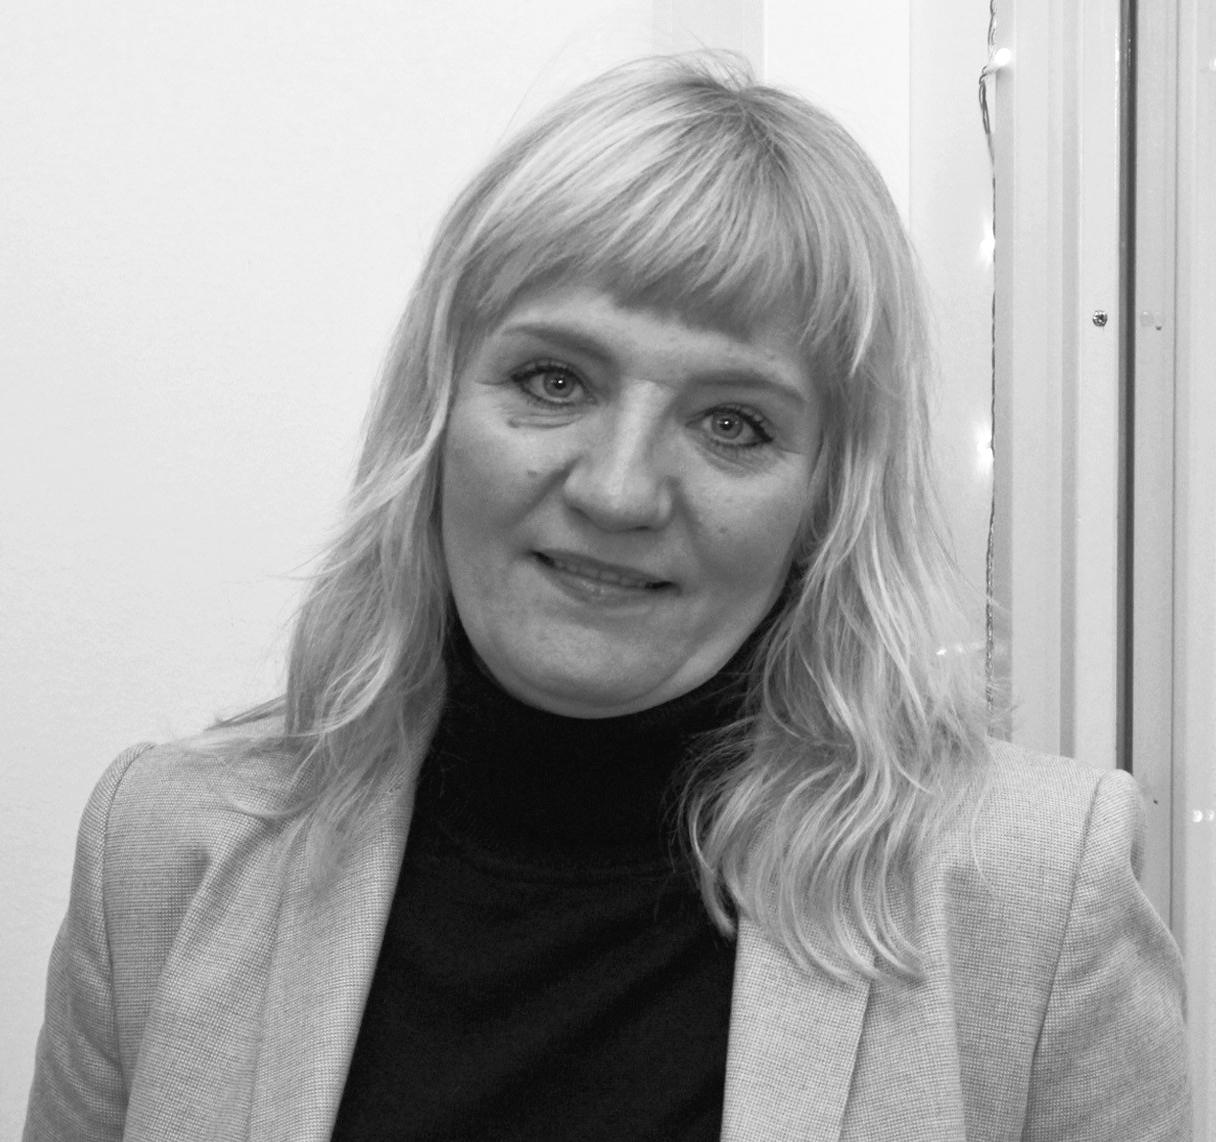 Ulrika Forsgren Hogman  Head of Communication at LTH, Lund University. Chairperson at the board of Föreningen Stapelbädden (STPLN)